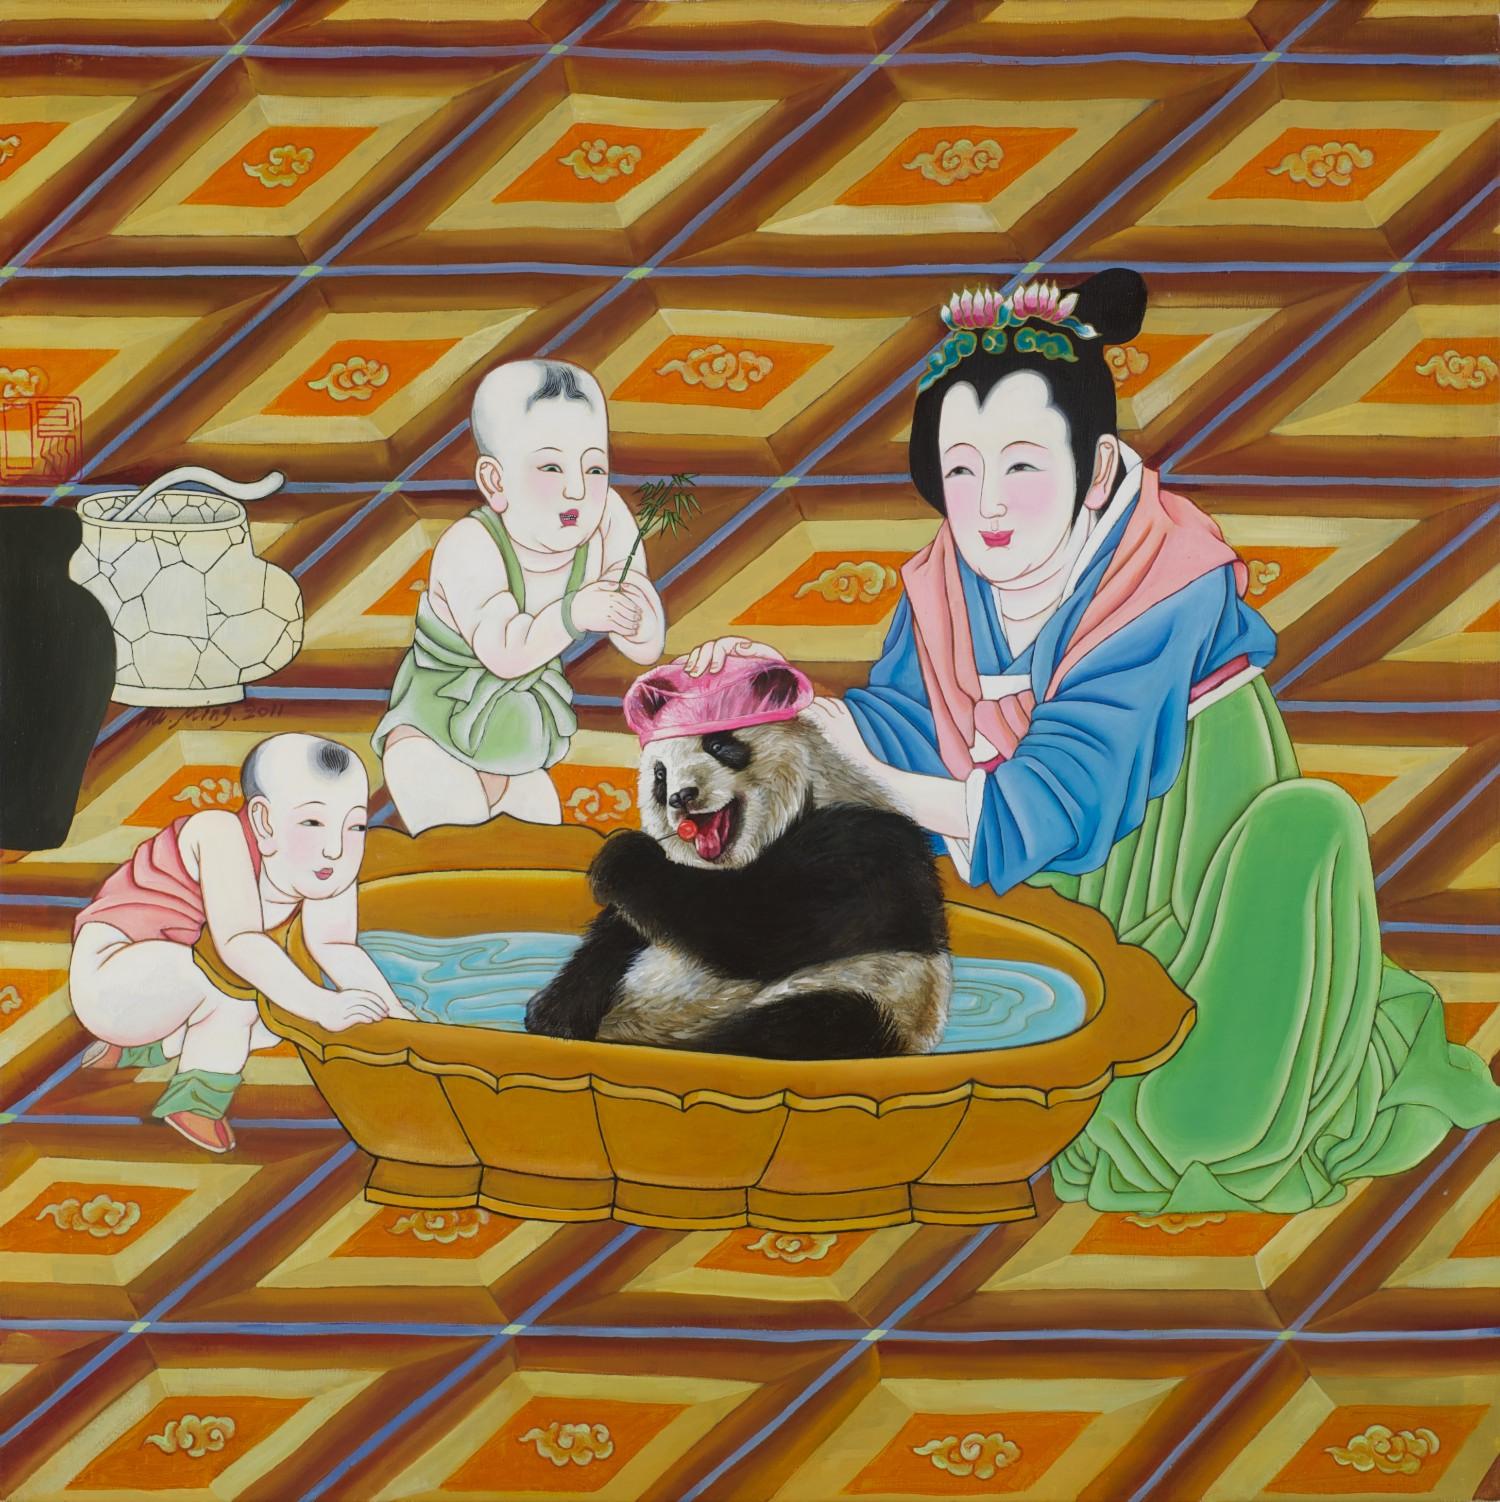 #13764 Hu Ming 'National Treasure' 101cm x 101cm $12,800